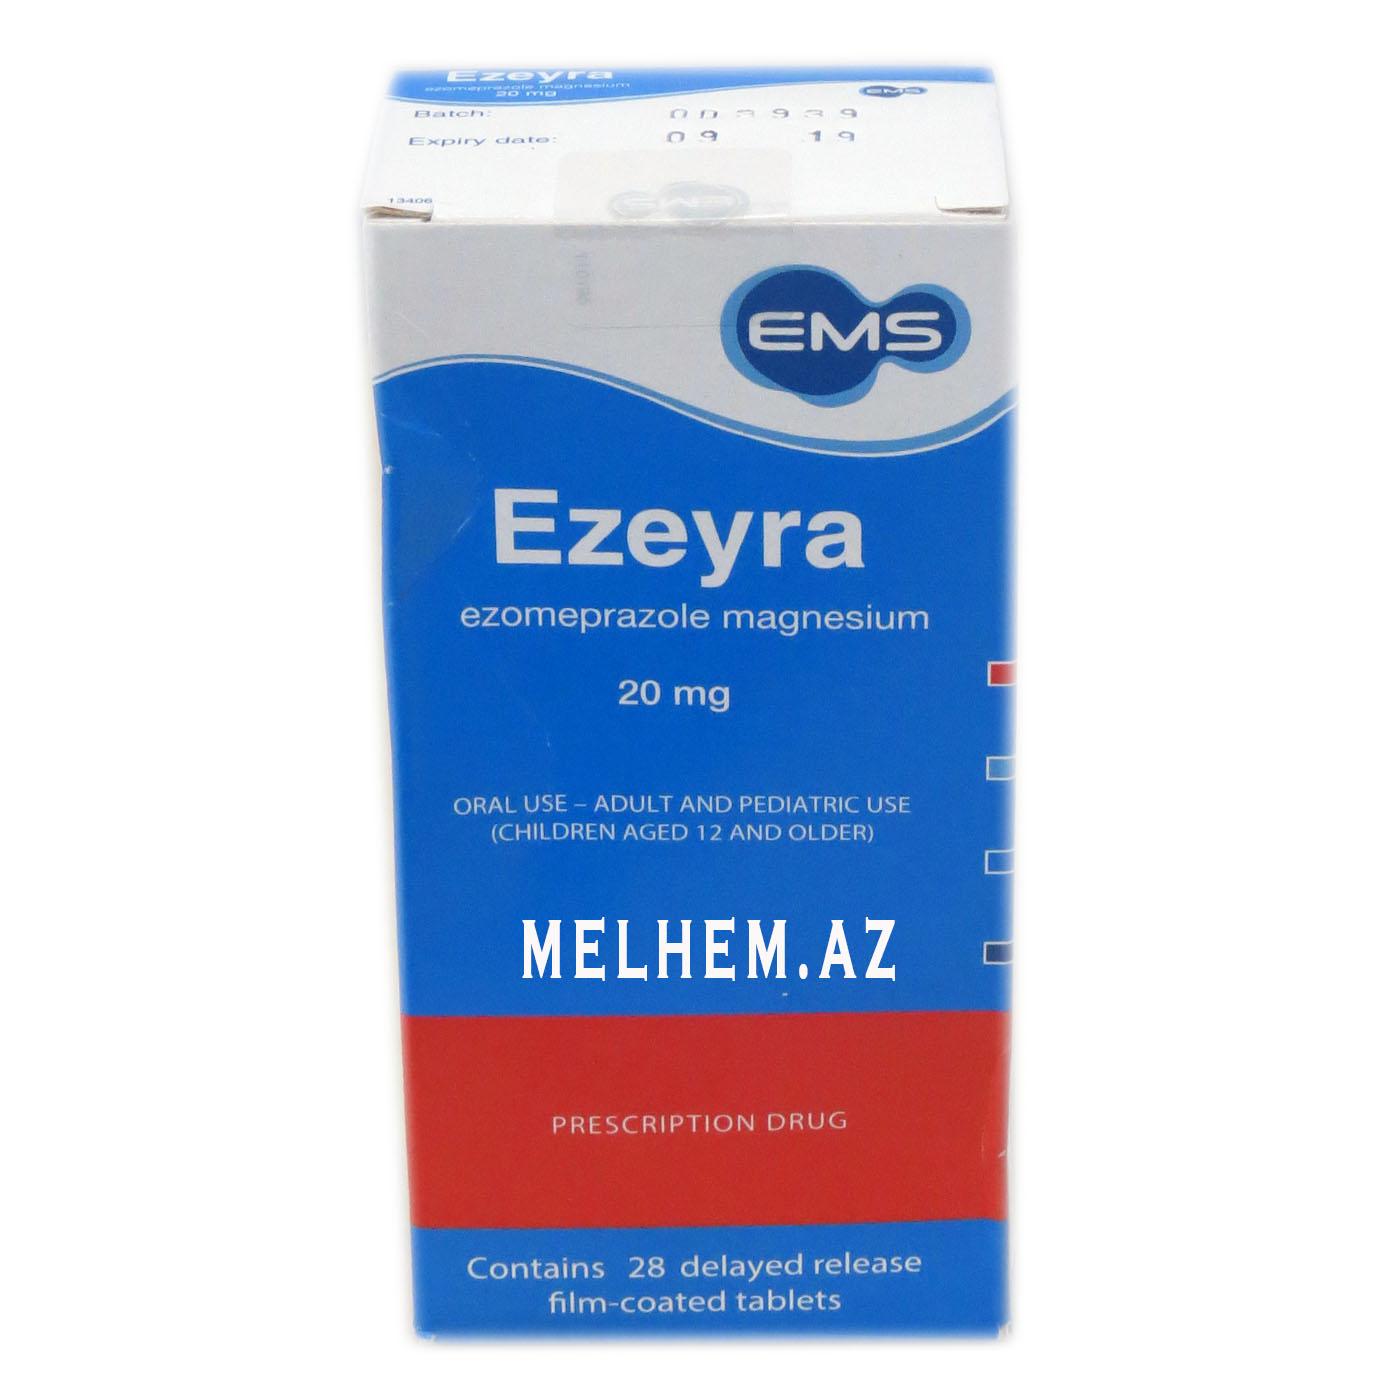 EZEYRA 20 MG